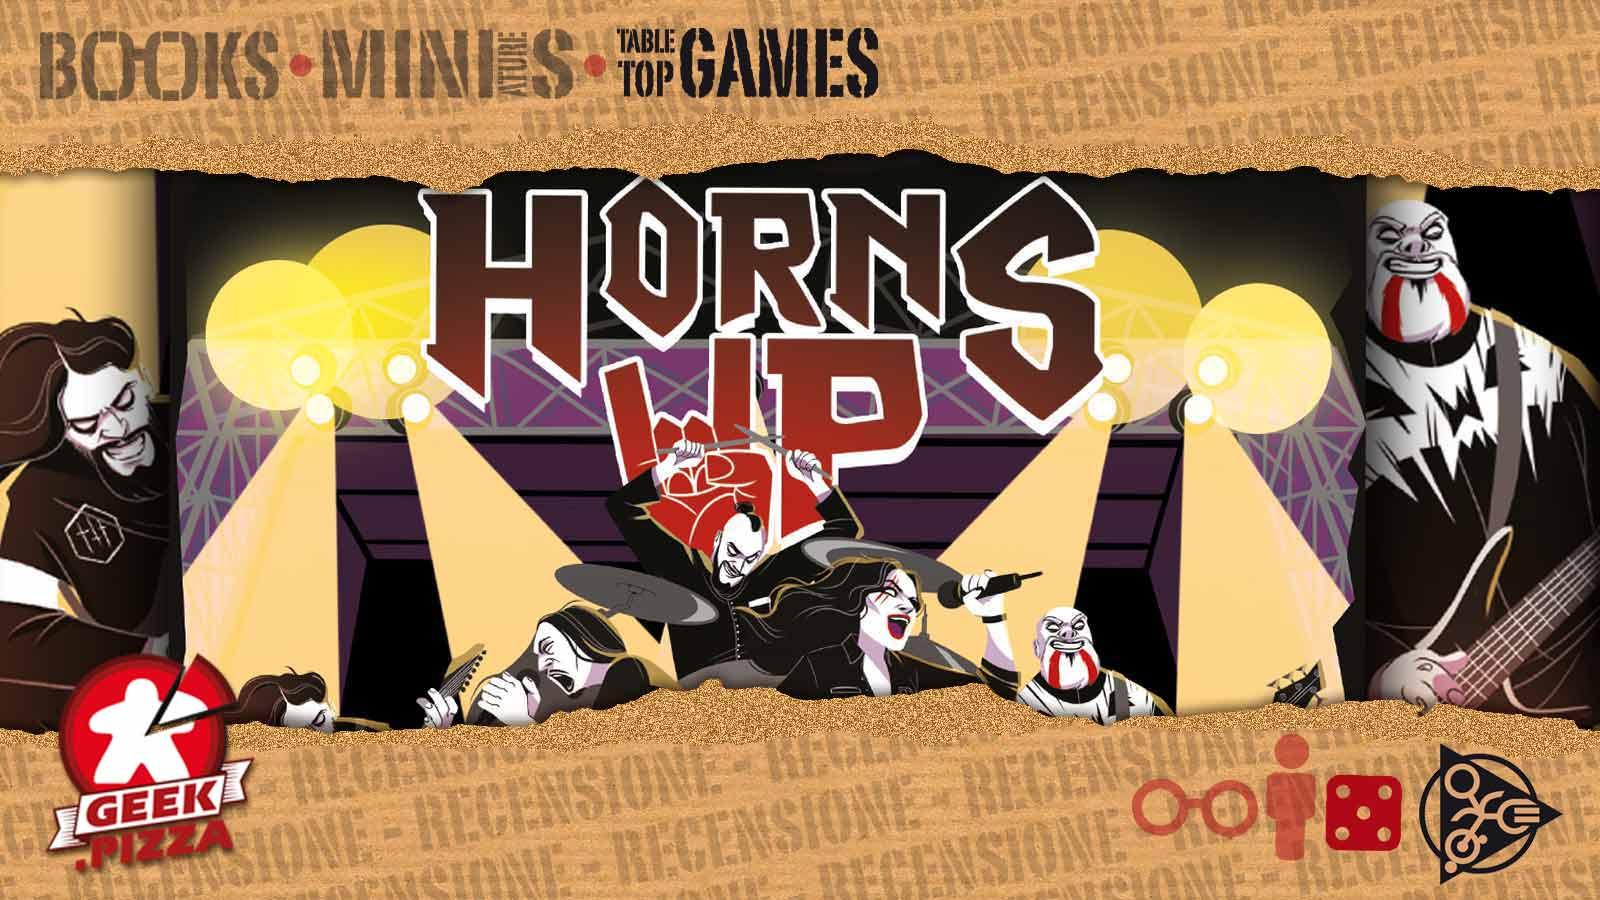 La Ludografica: Horns Up